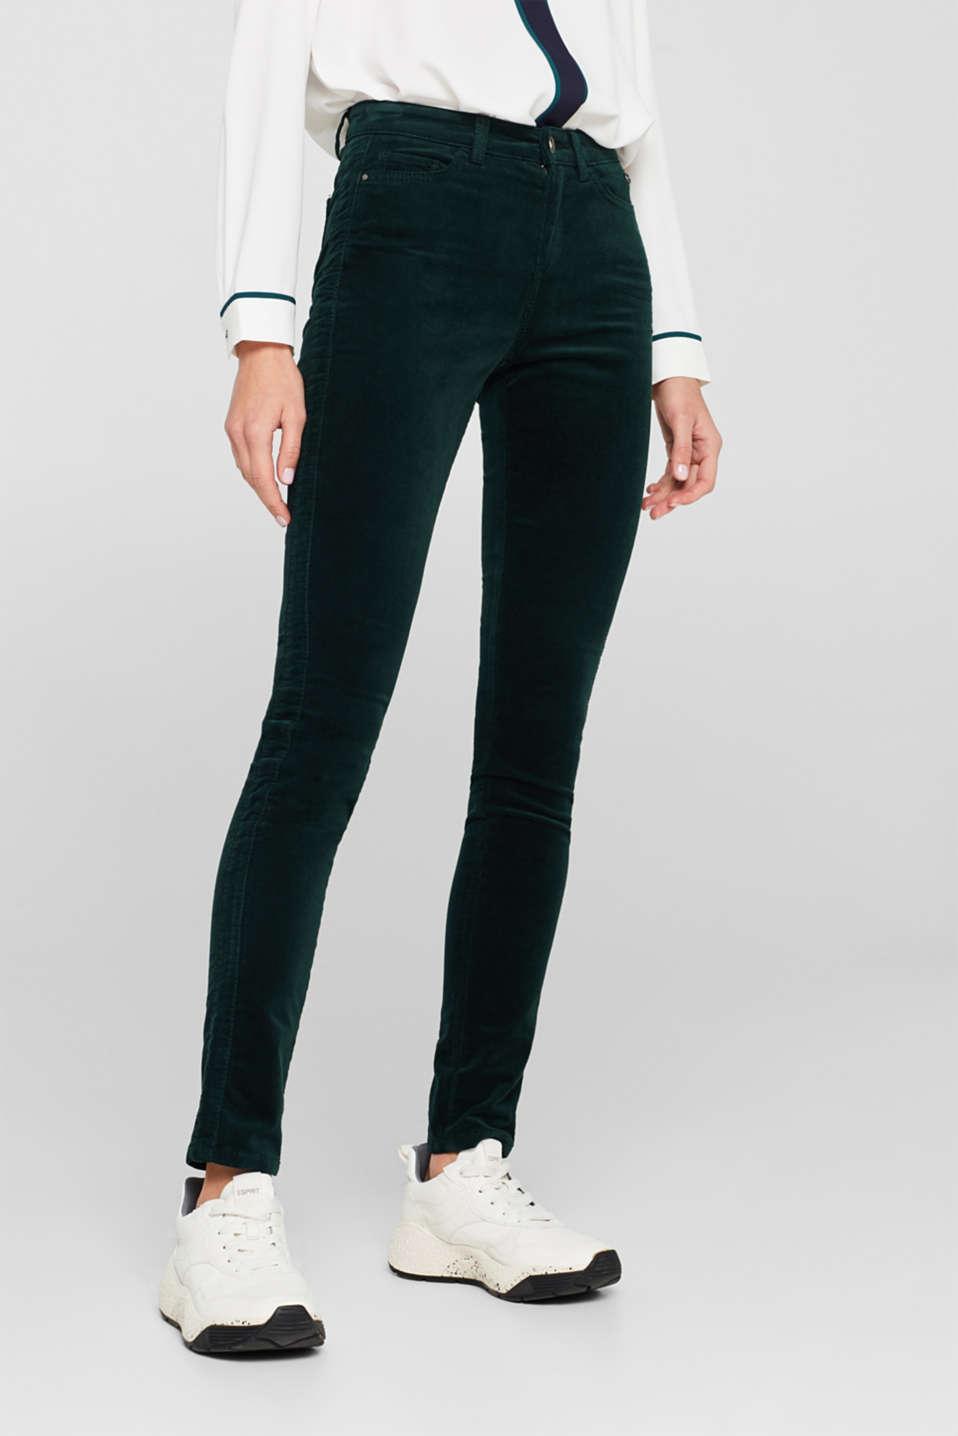 Pants woven, DARK TEAL GREEN, detail image number 5